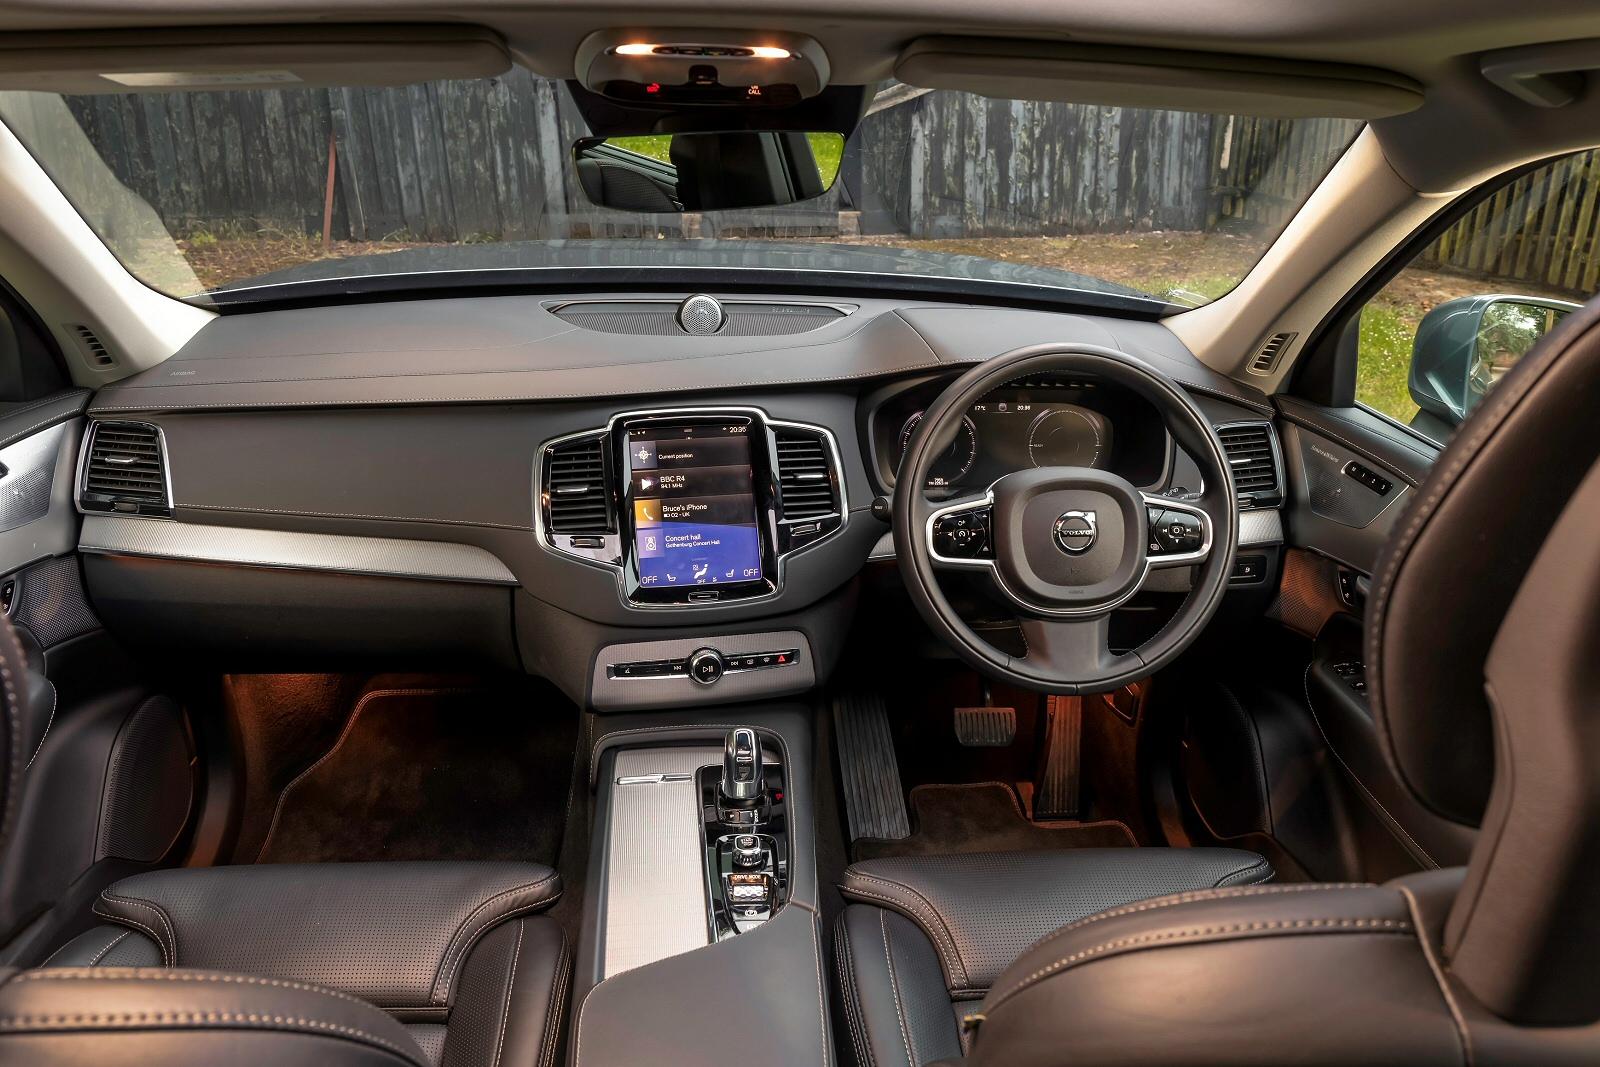 New Volvo Xc90 2 0 T5 250 Momentum 5dr Awd Gtron Petrol